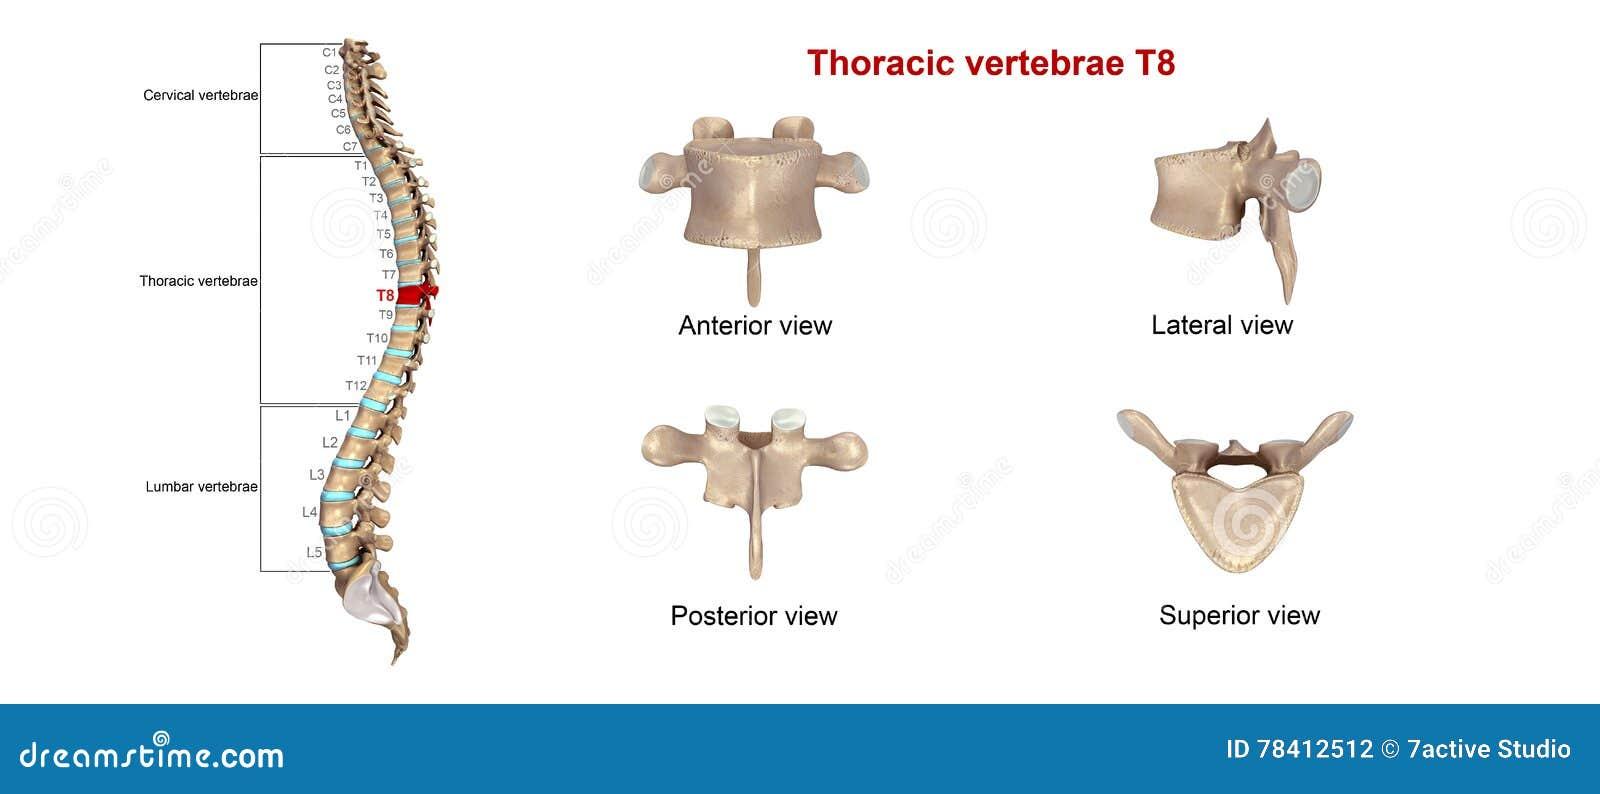 Thoracic Vertebrae T8 Stock Illustration - Image: 78412567